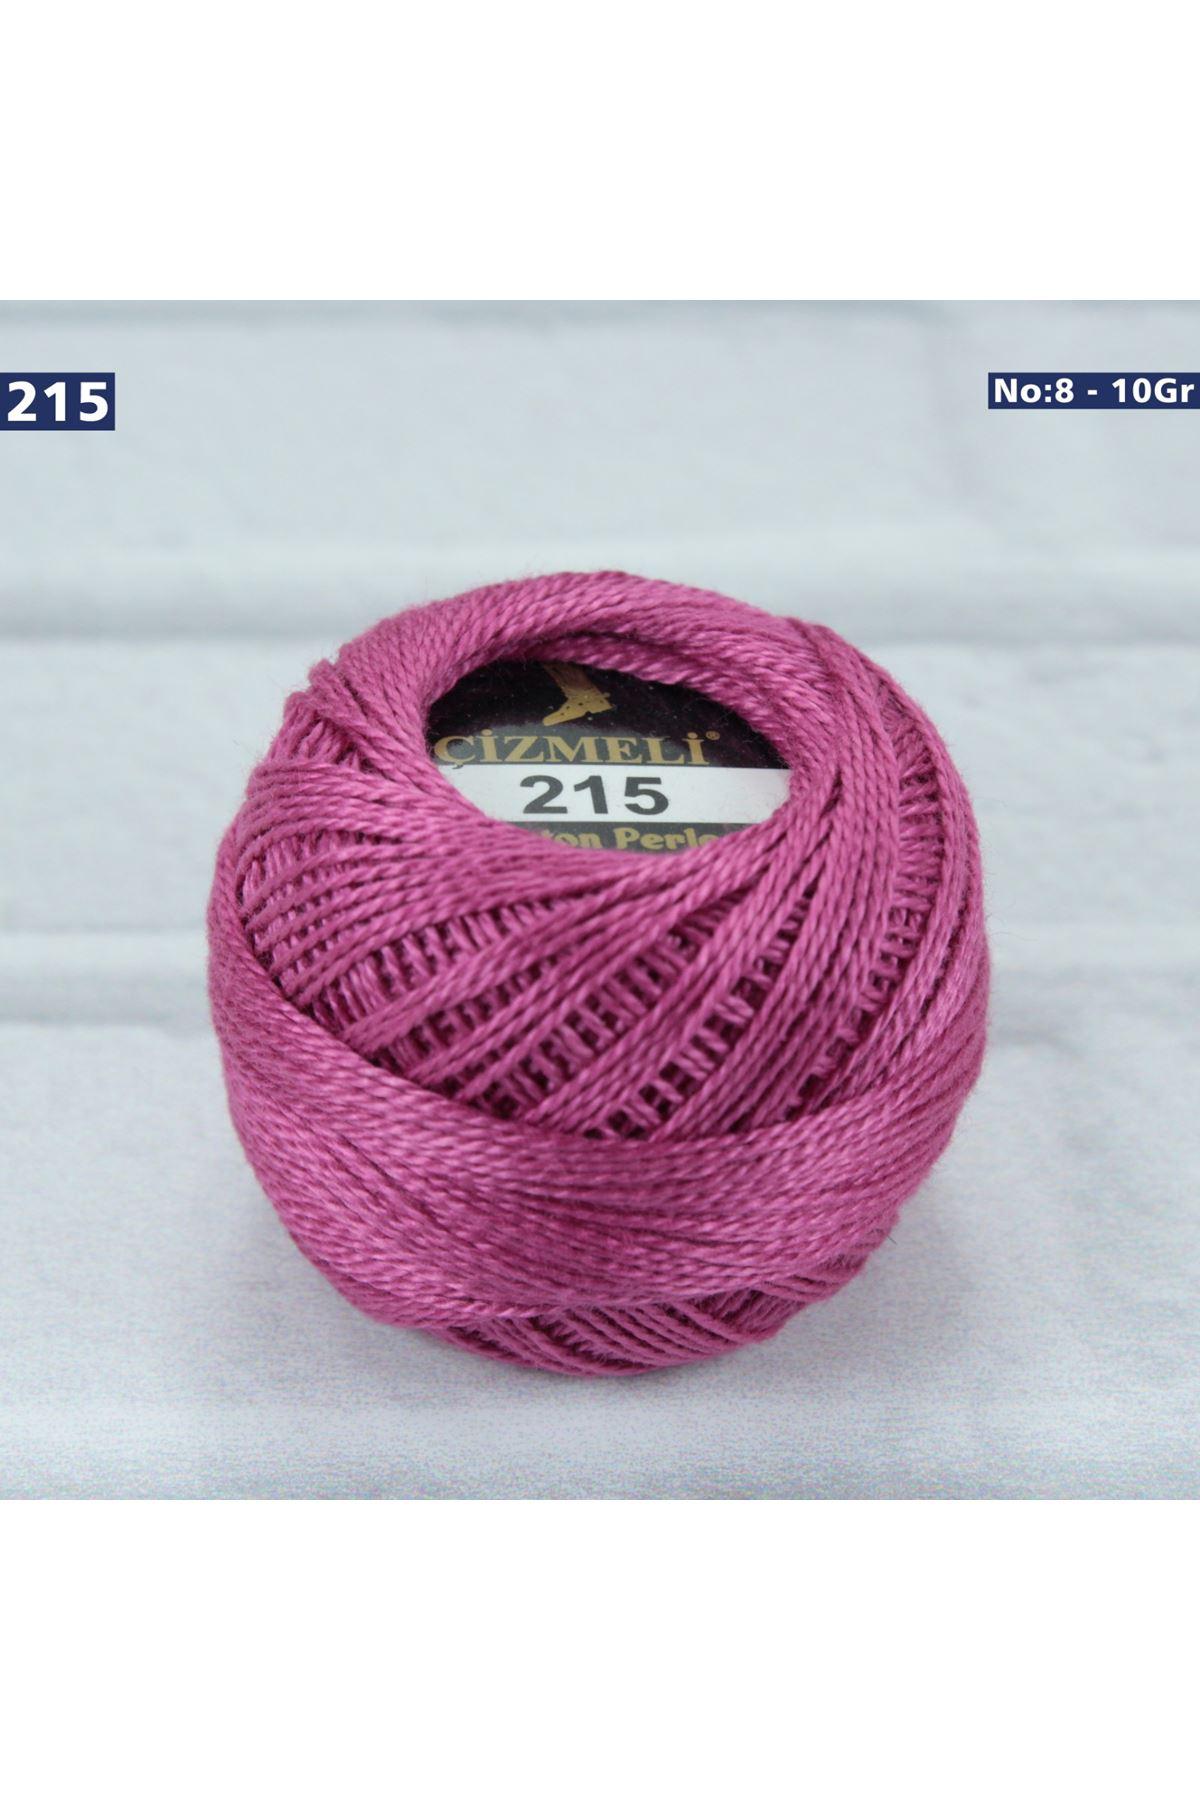 Çizmeli Cotton Perle Nakış İpliği No: 215